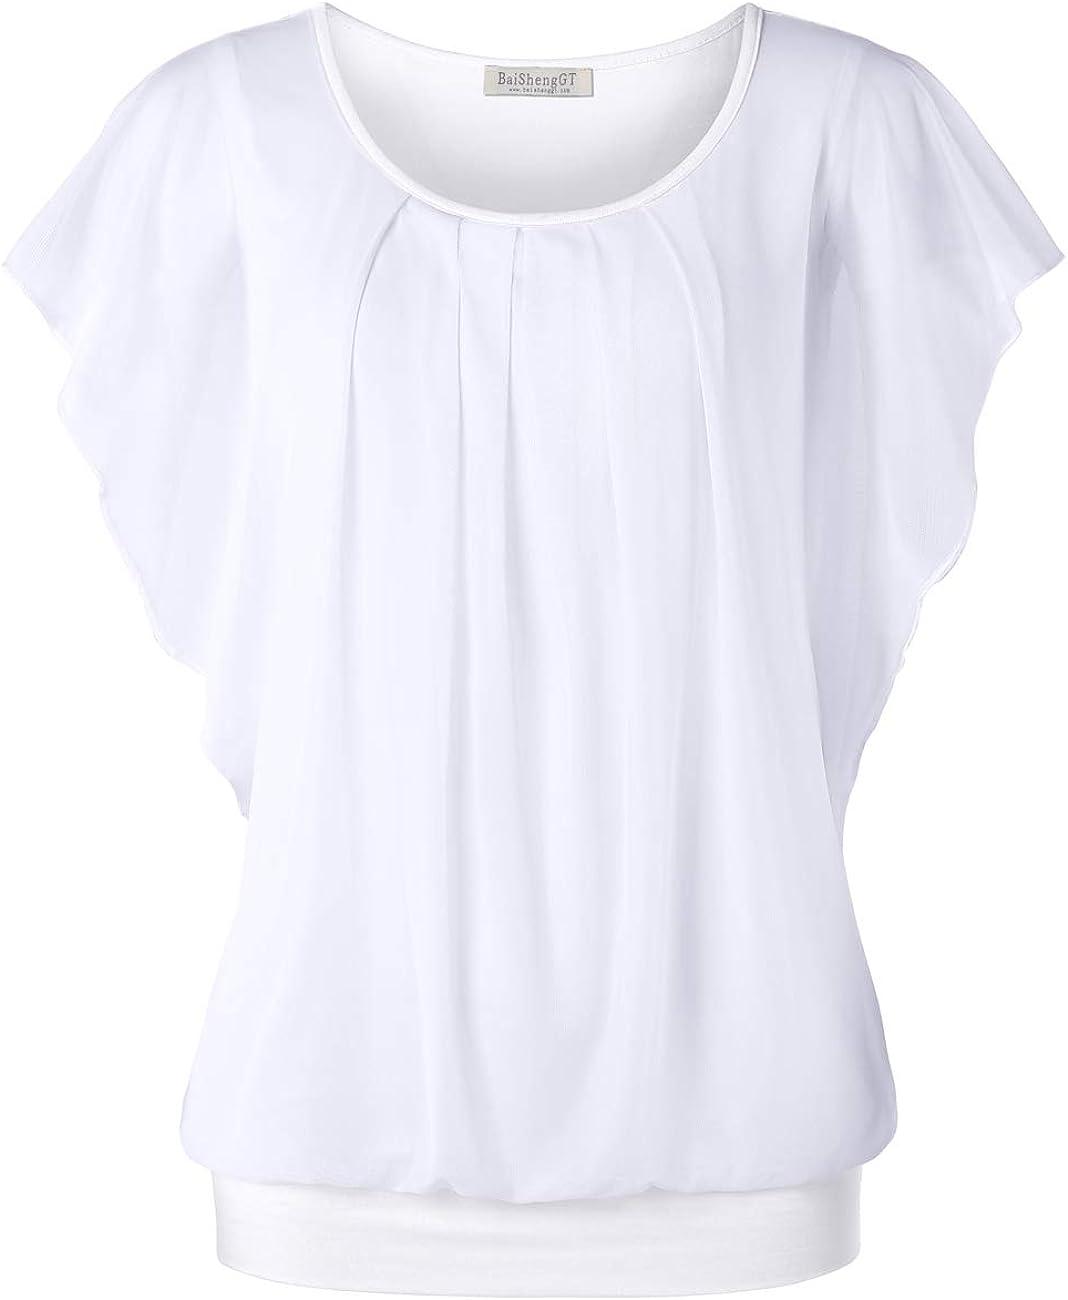 BAISHENGGT Damen Falten Kurzarm Tunika Batwing Rundkragen Bluse: Amazon.de: Bekleidung - Tunika weiss